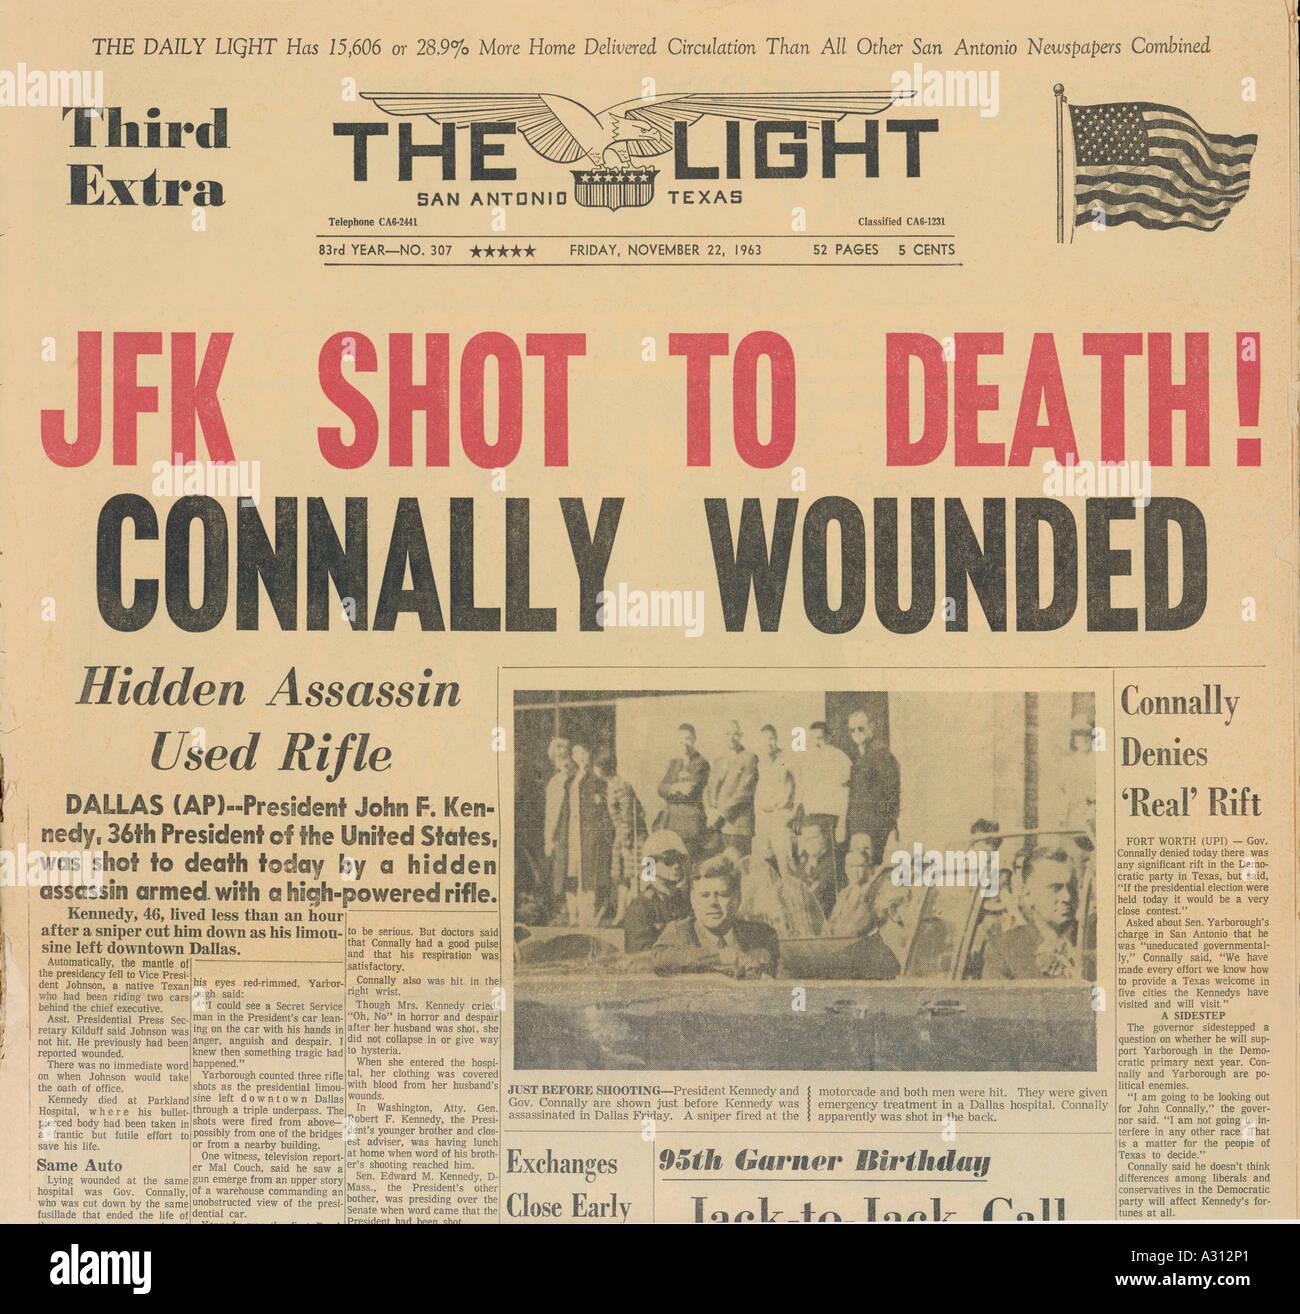 Jfk Assassinated Paper - Stock Image